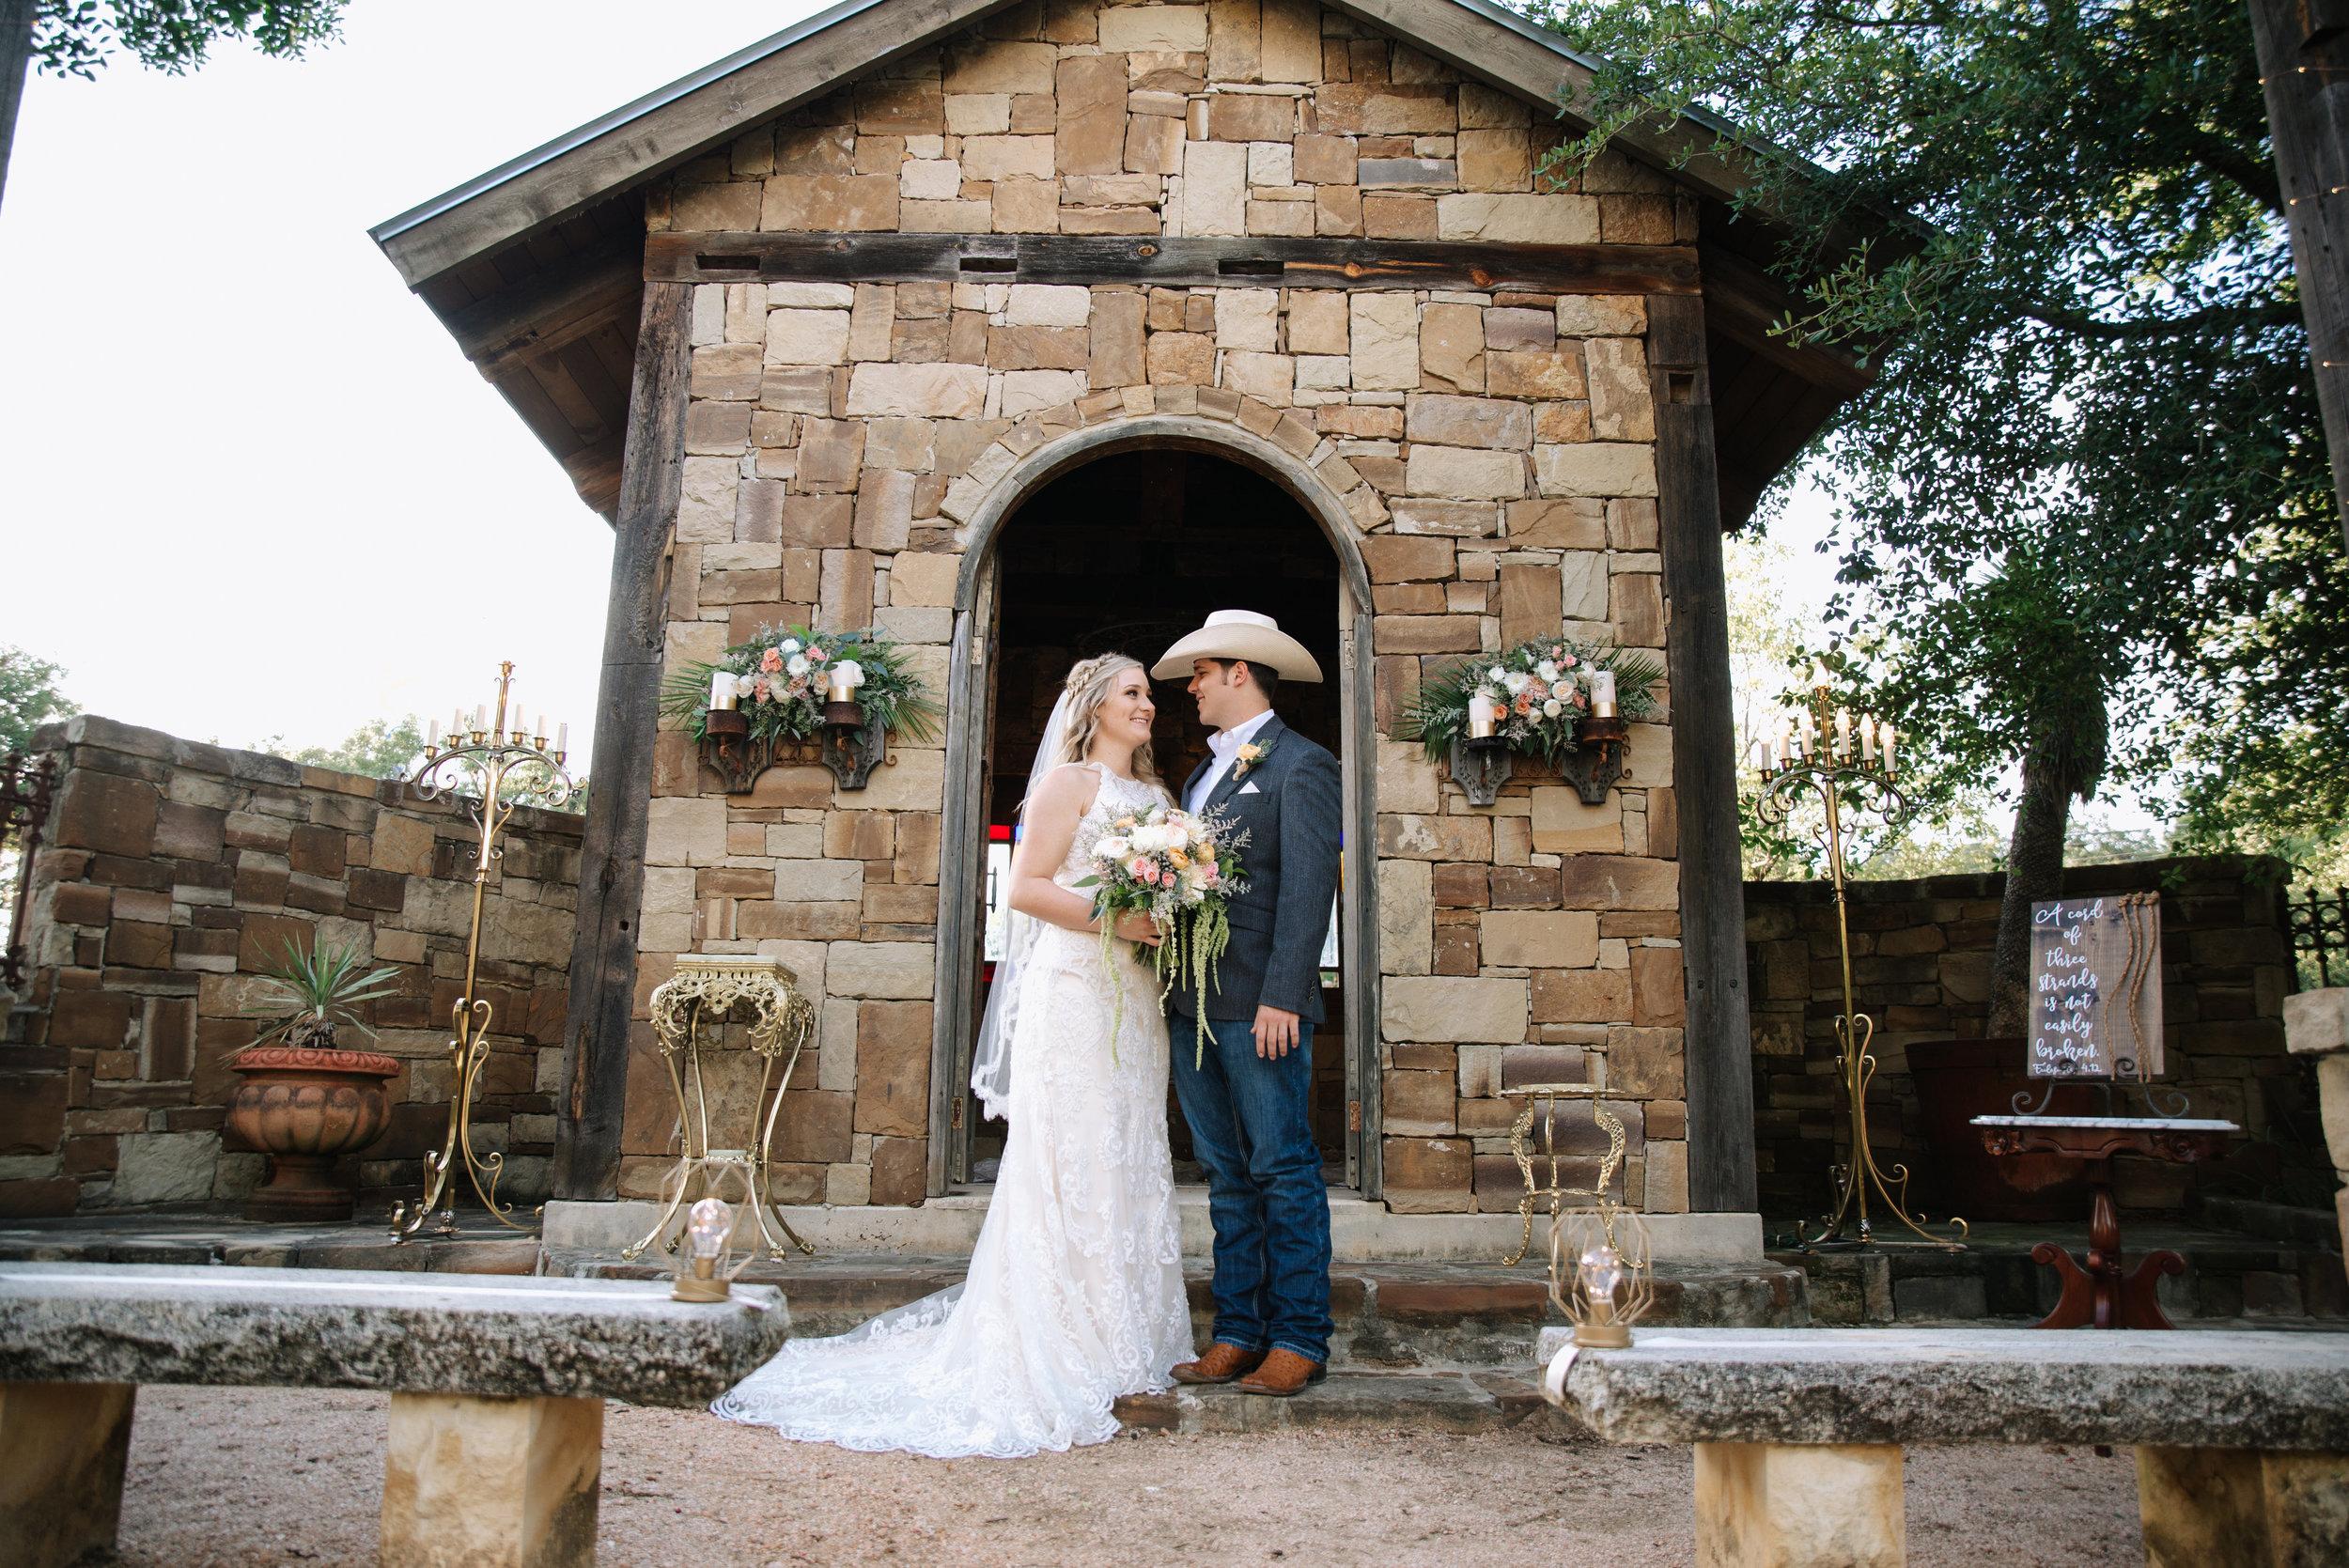 mcclure-boerne-wedding-portraits-sojourn-art-and-ink.jpg